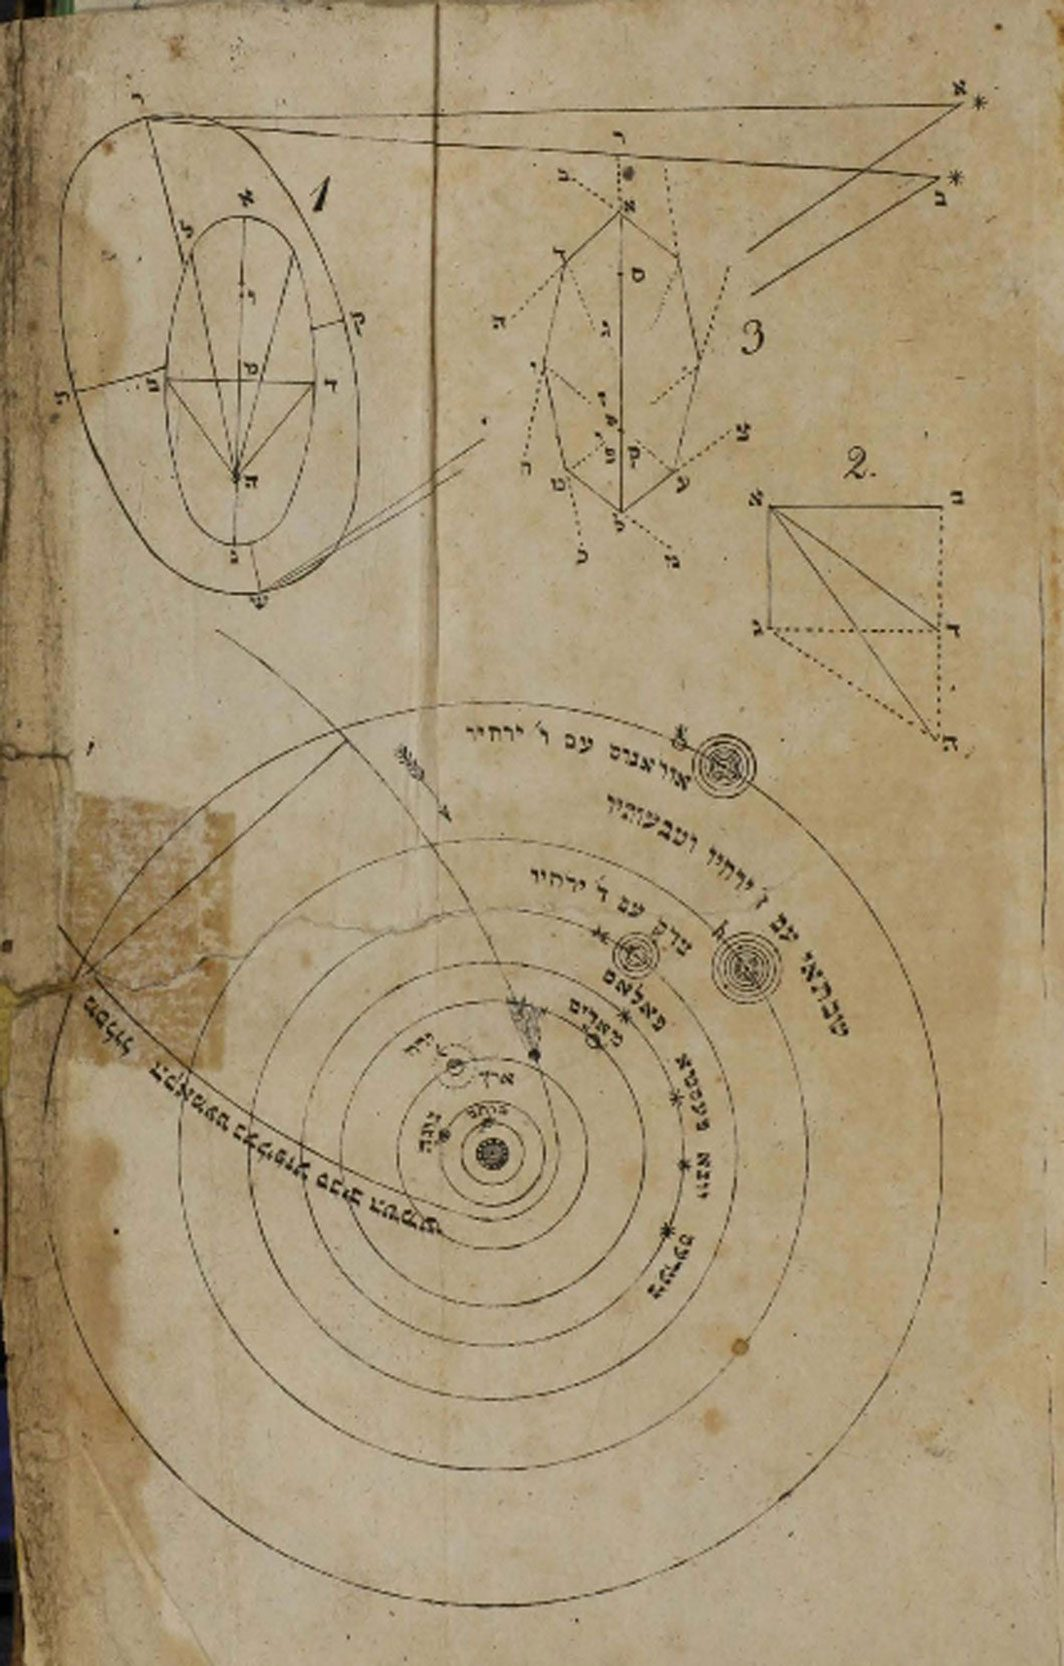 Astronomical diagram